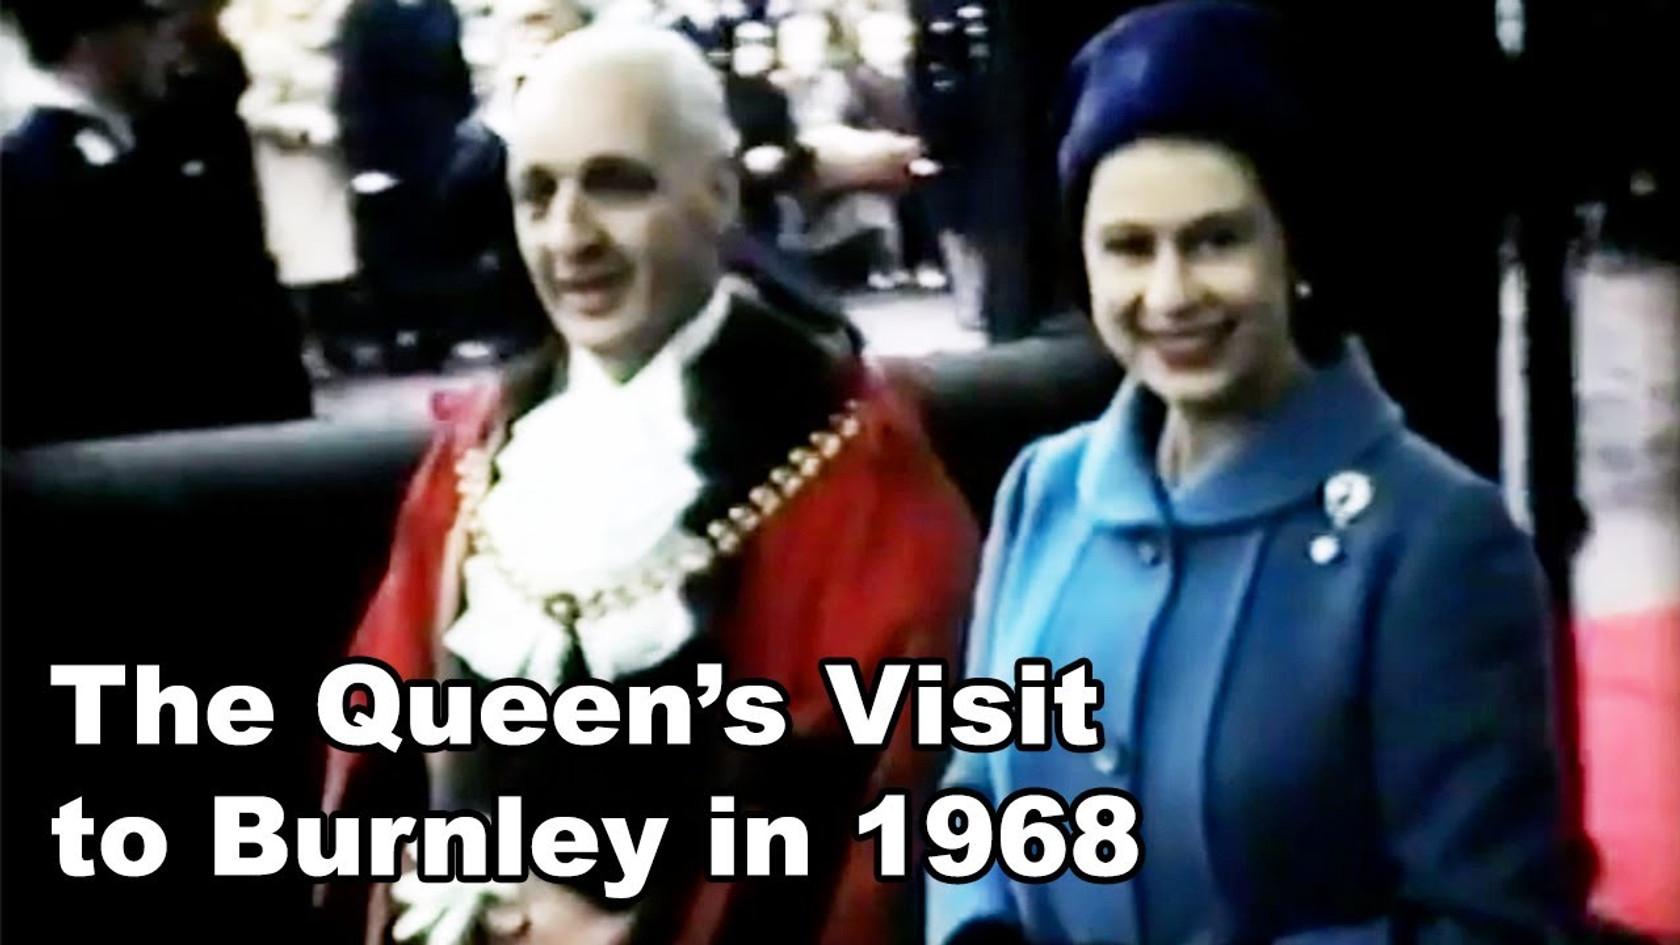 The Queen visits Burnley in 1968